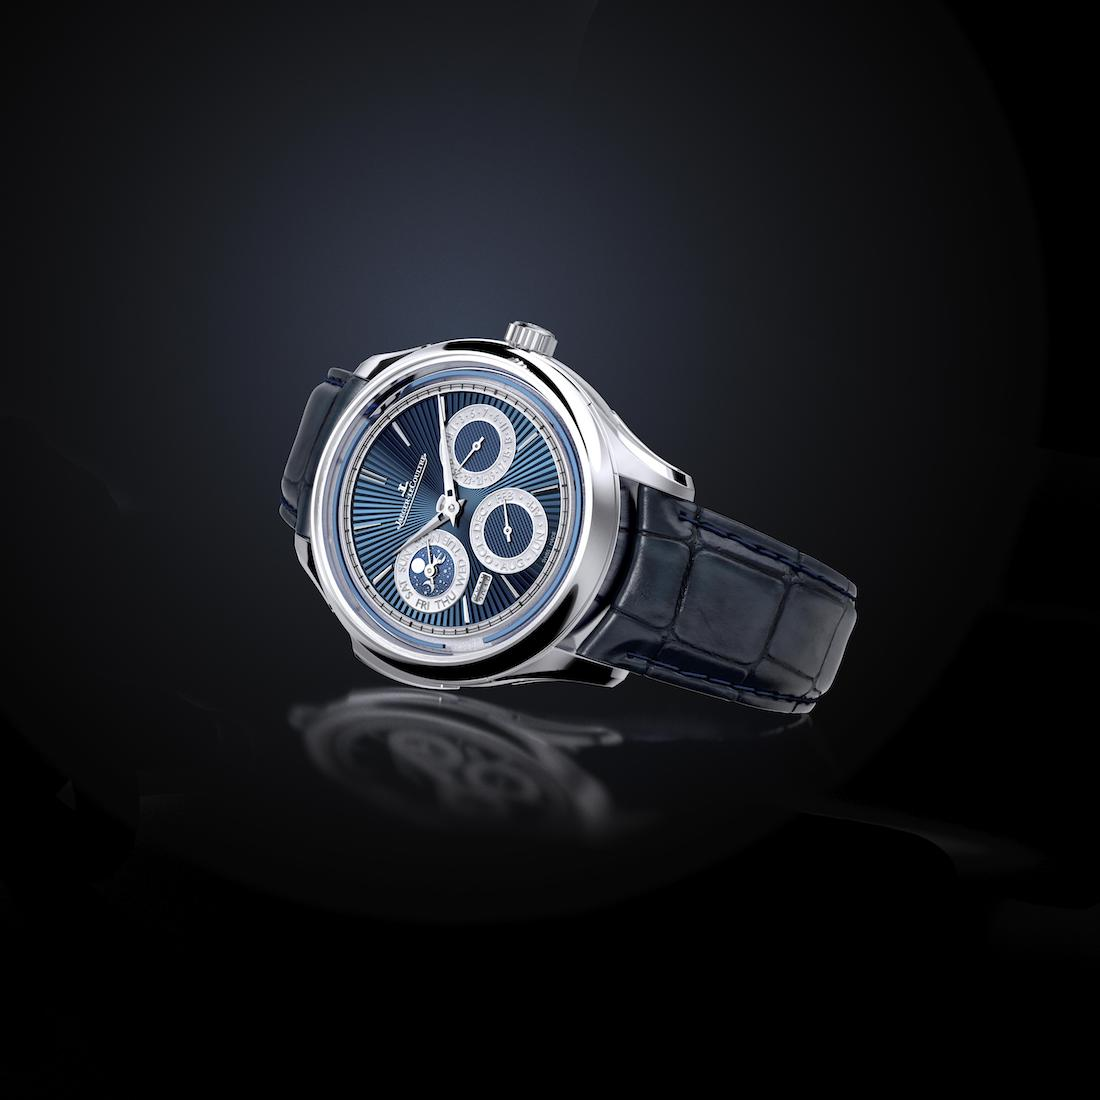 Orologi Jaeger-LeCoultre